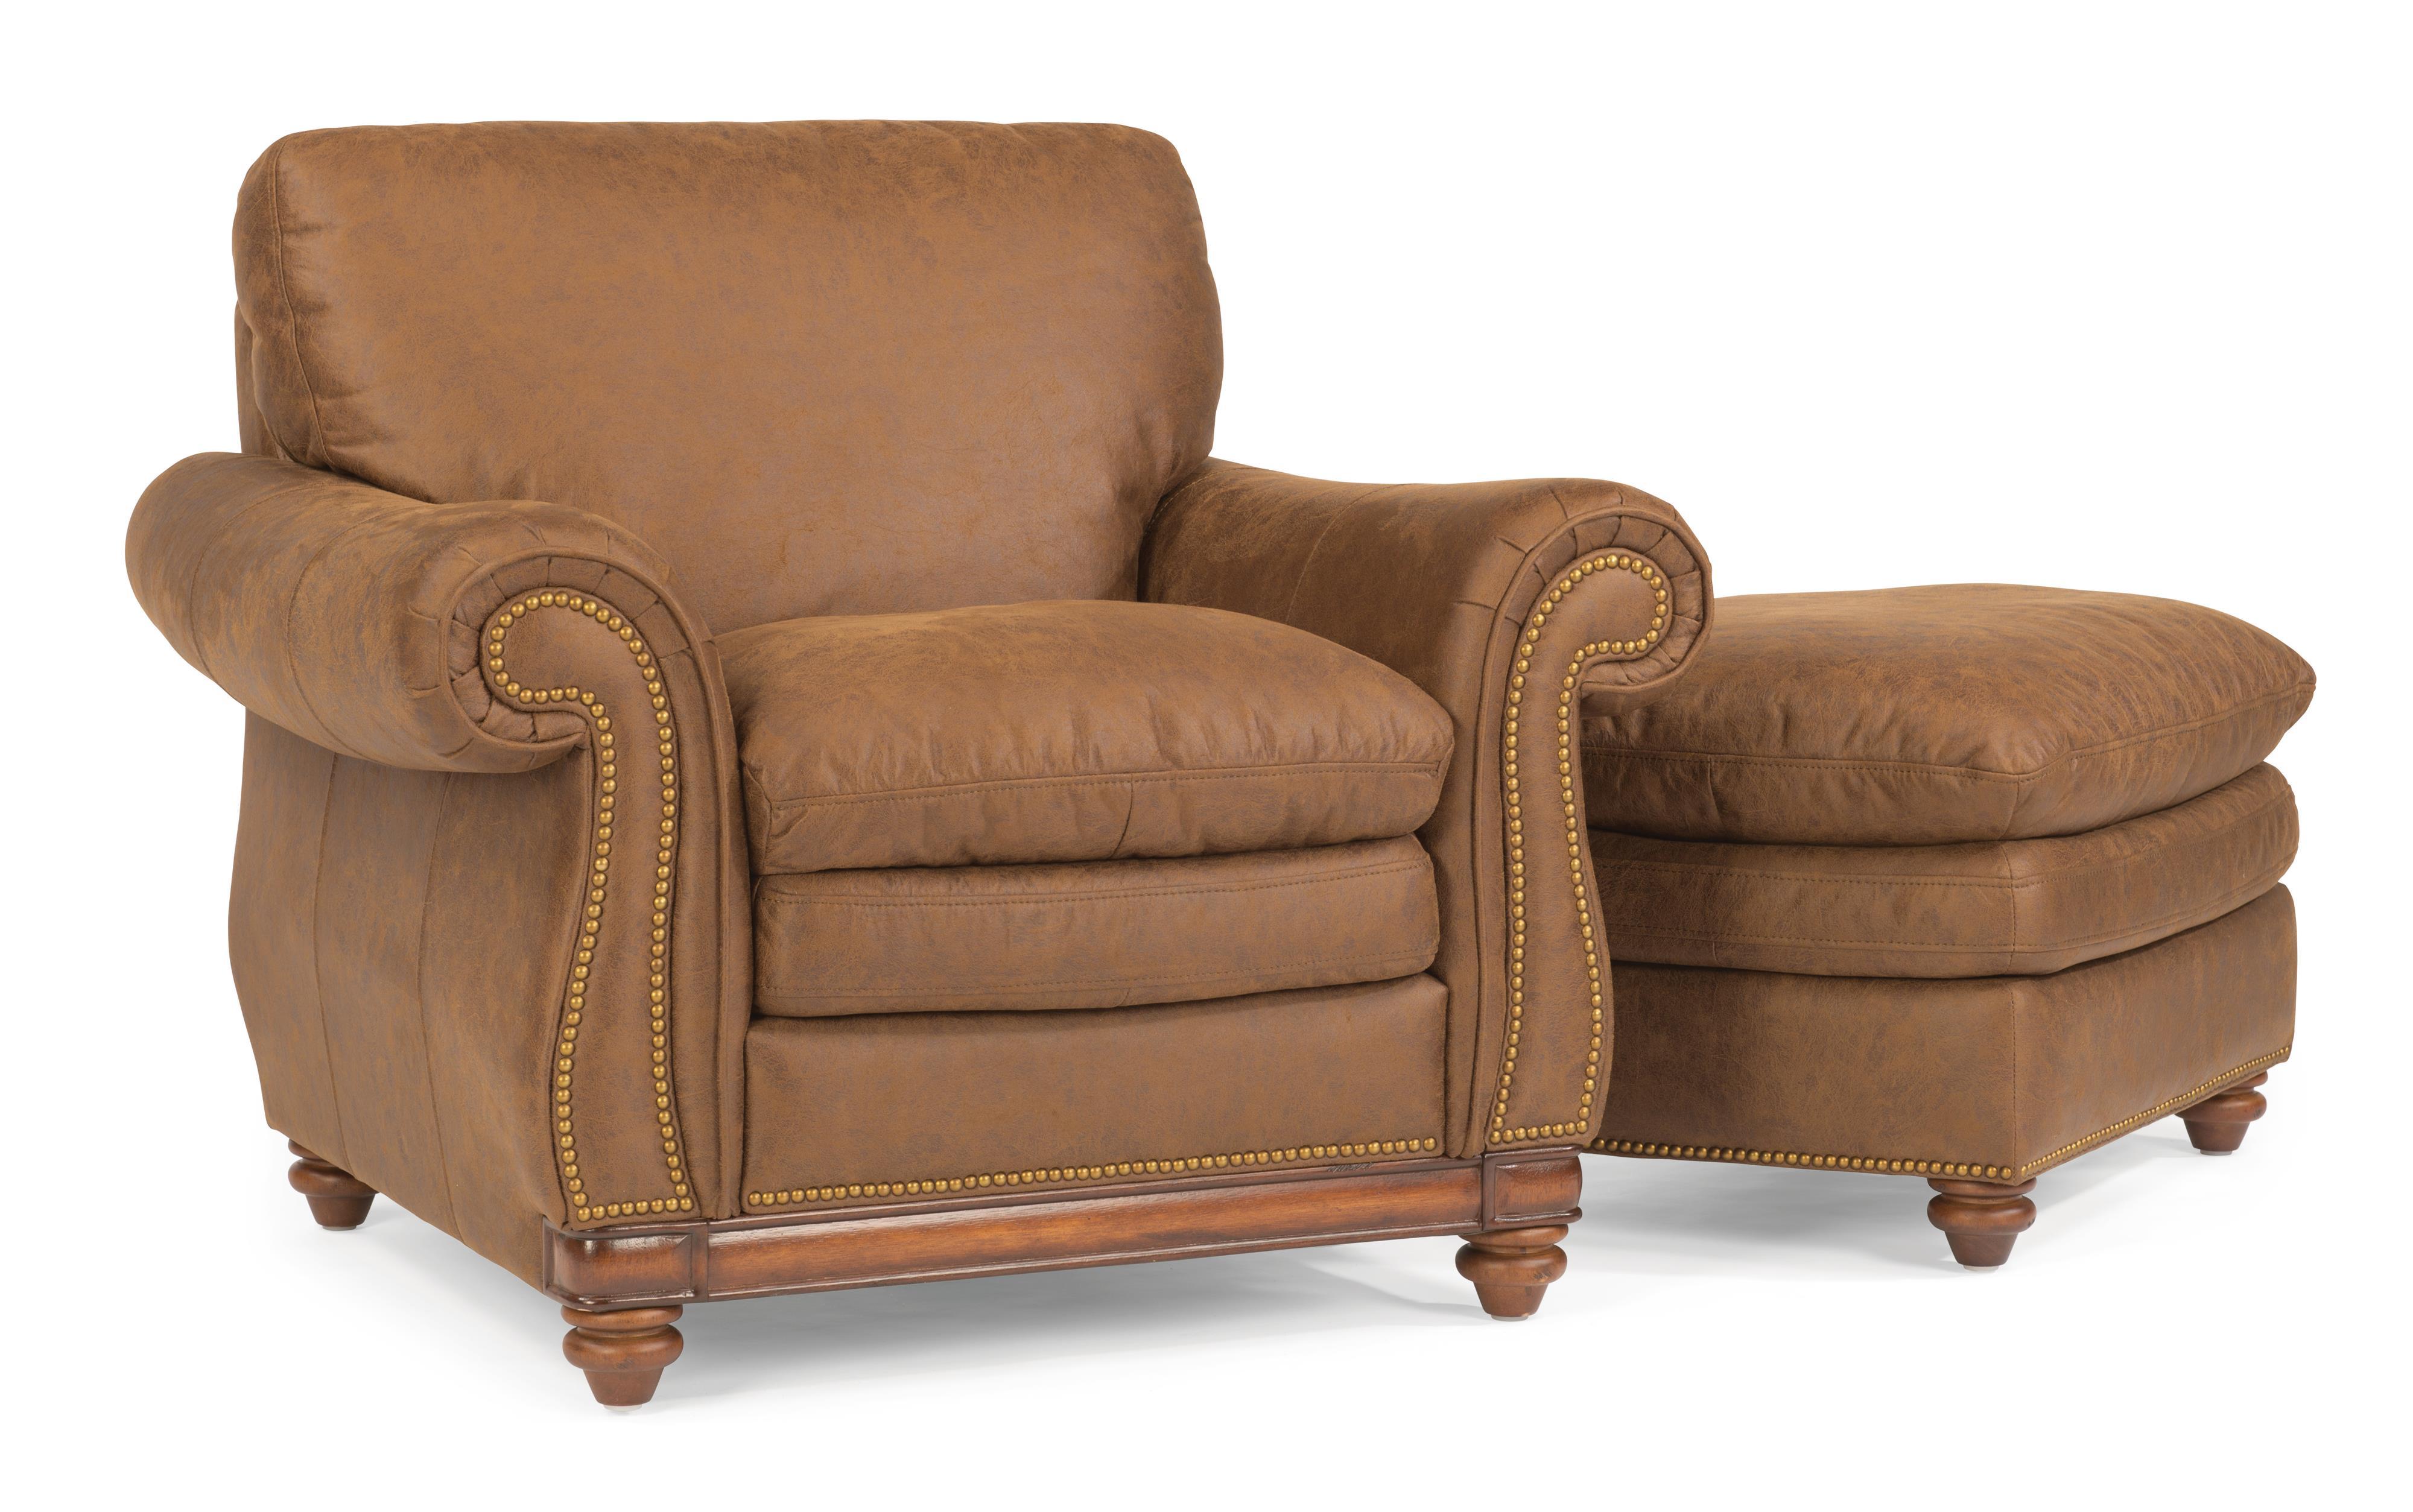 Flexsteel Belvedere Chair and Ottoman - Item Number: 1605-10+1605-08